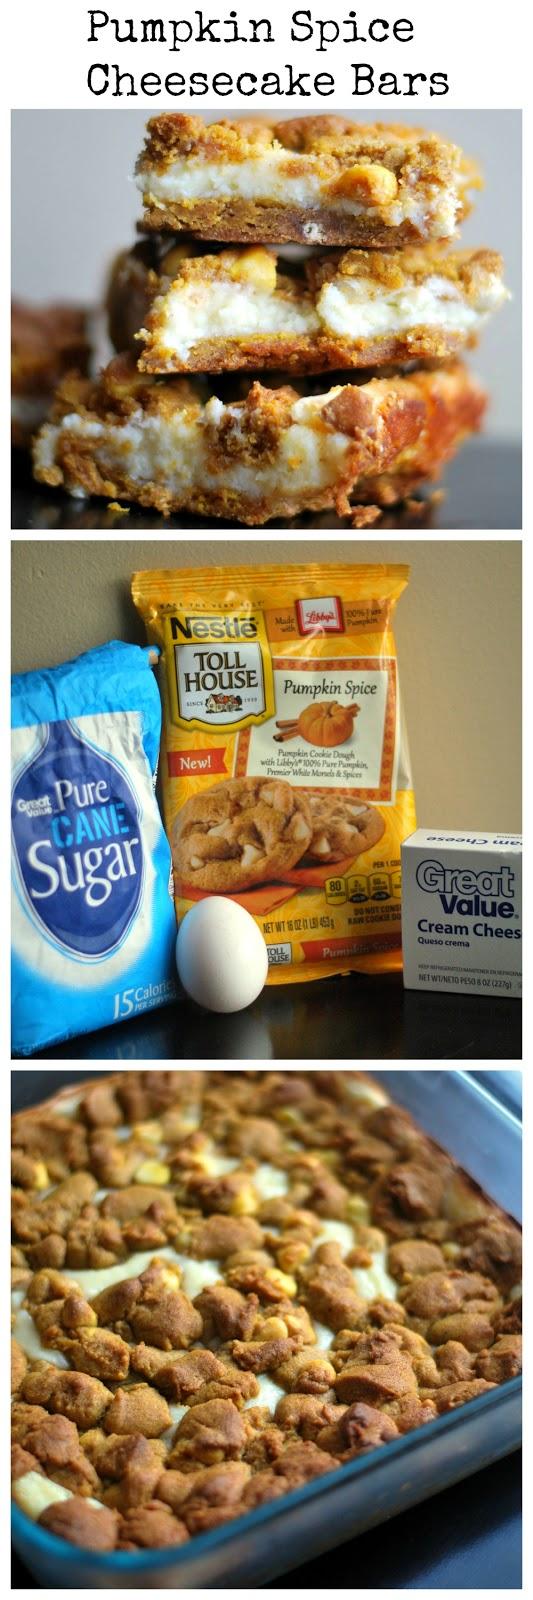 Pumpkin Spice Cheesecake Bars | Aunt Bee's Recipes